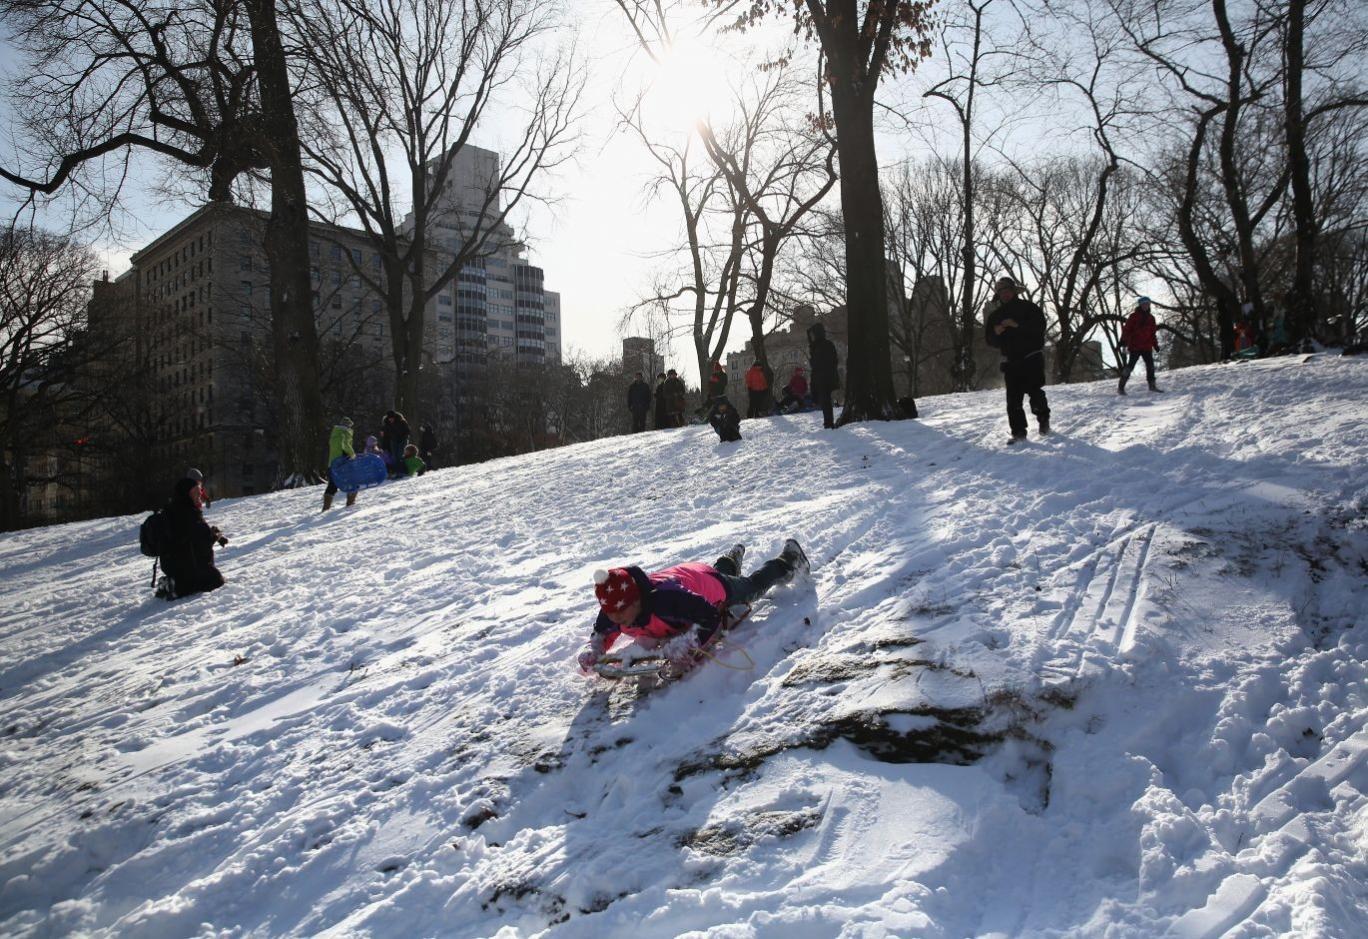 Uphill battle: New York's snowstorm is the first test of Bill de Blasio's term as Mayor